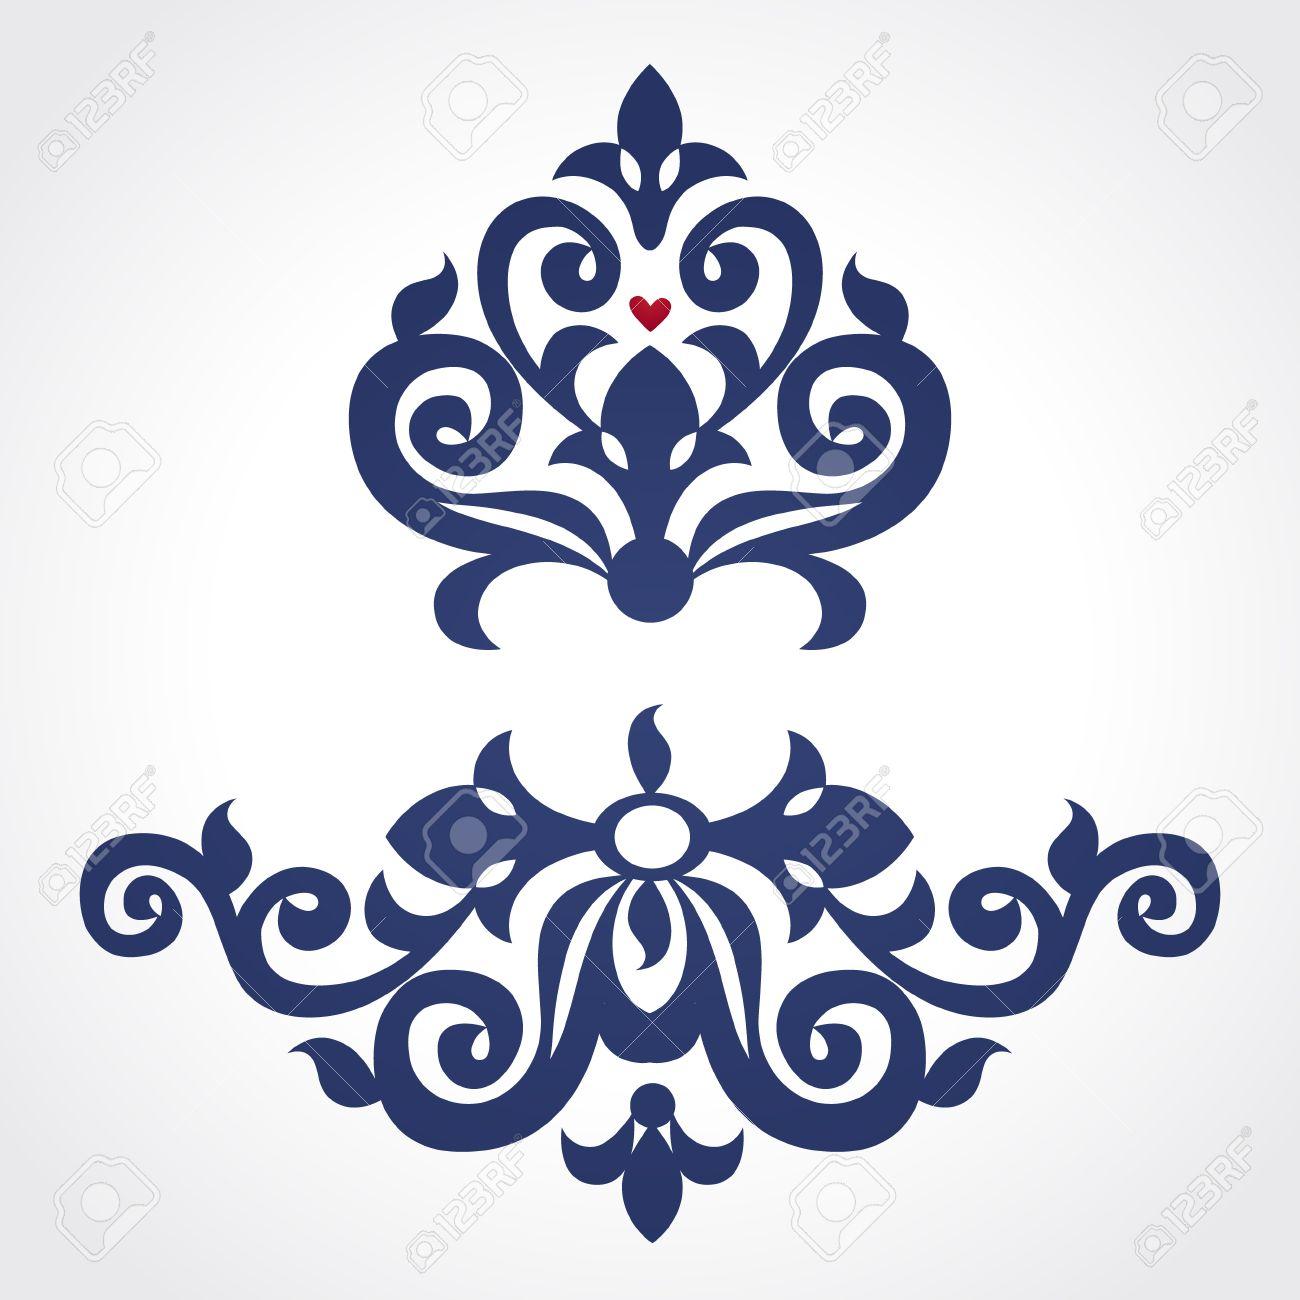 Vector Barocke Ornament Im Viktorianischen Stil. Verziert Element ...